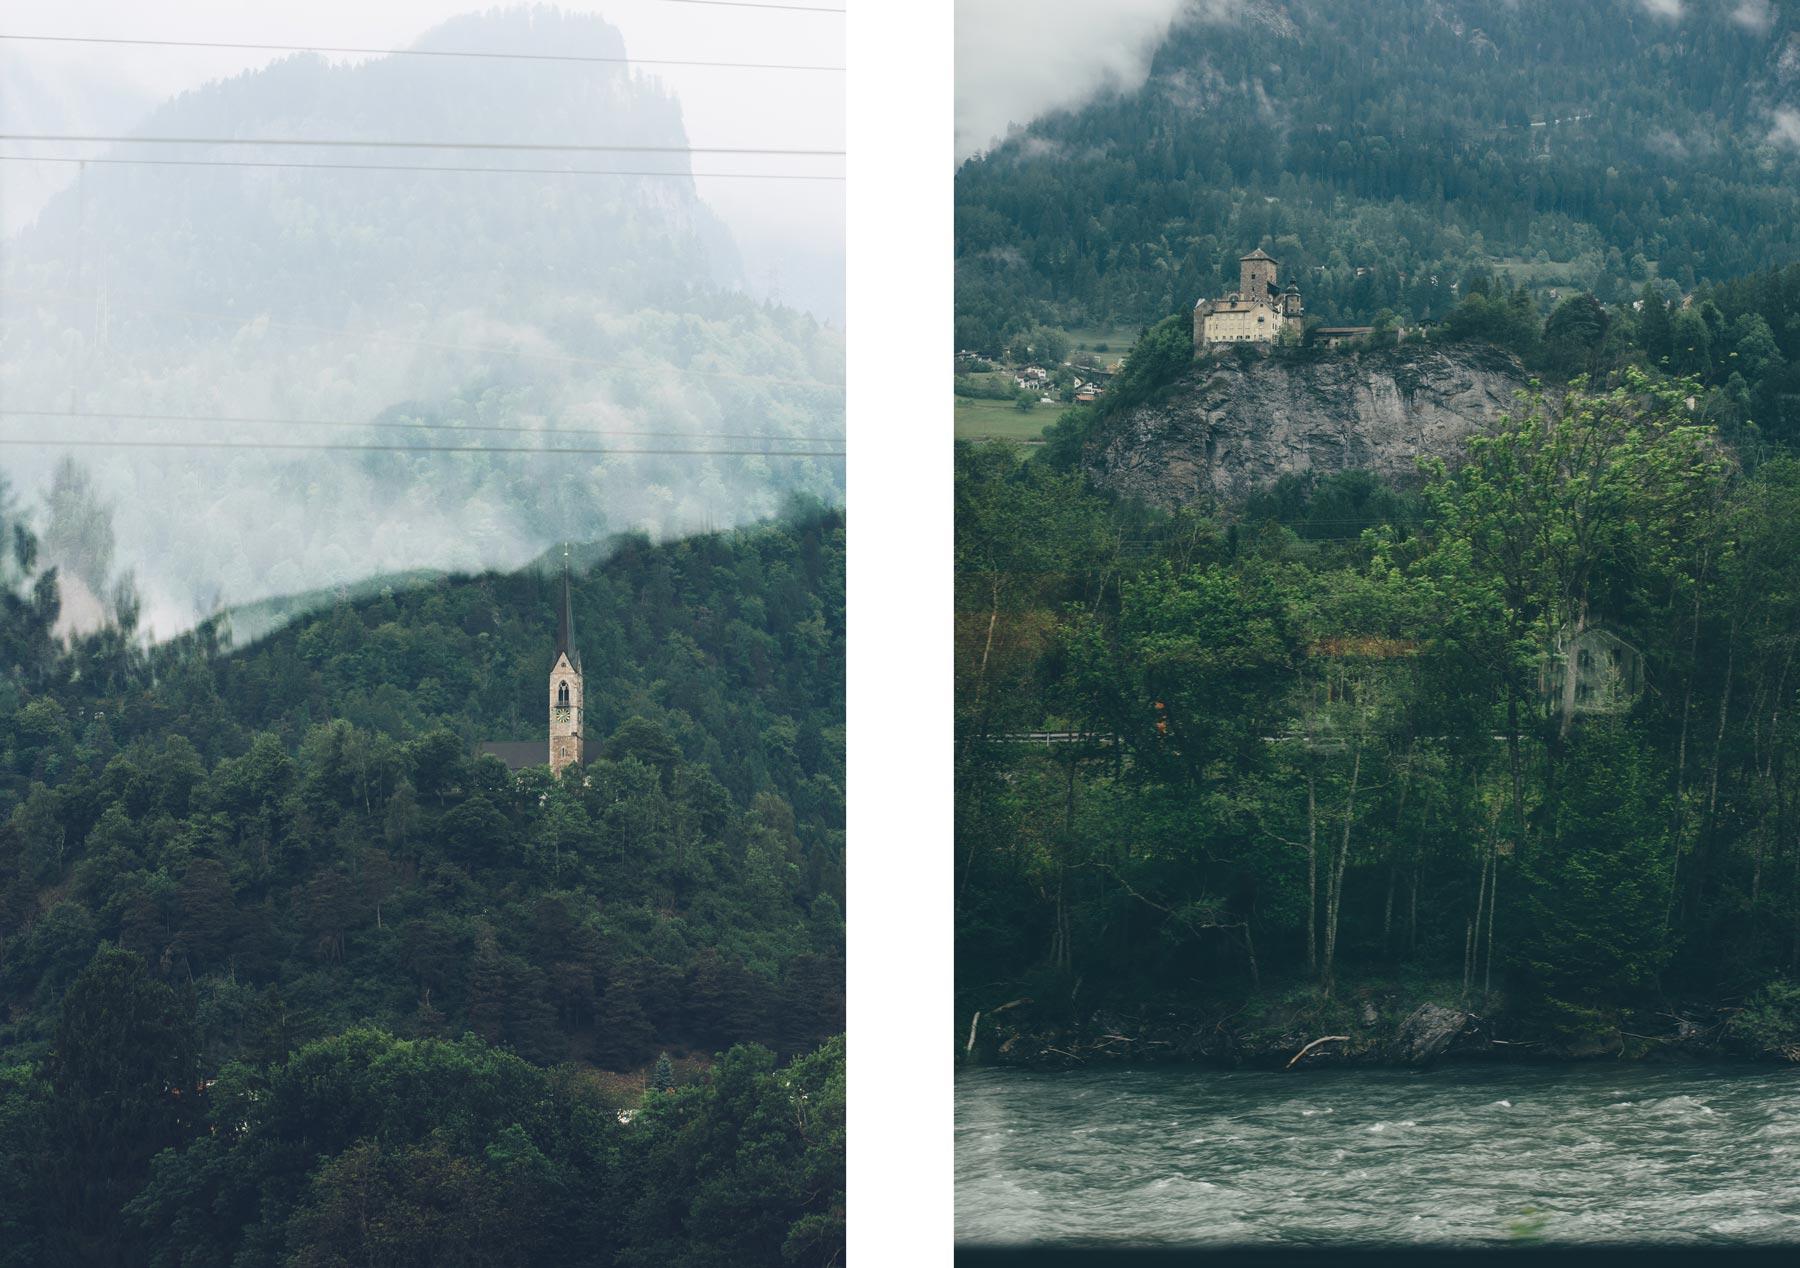 La Suisse à bord du Bernina Express